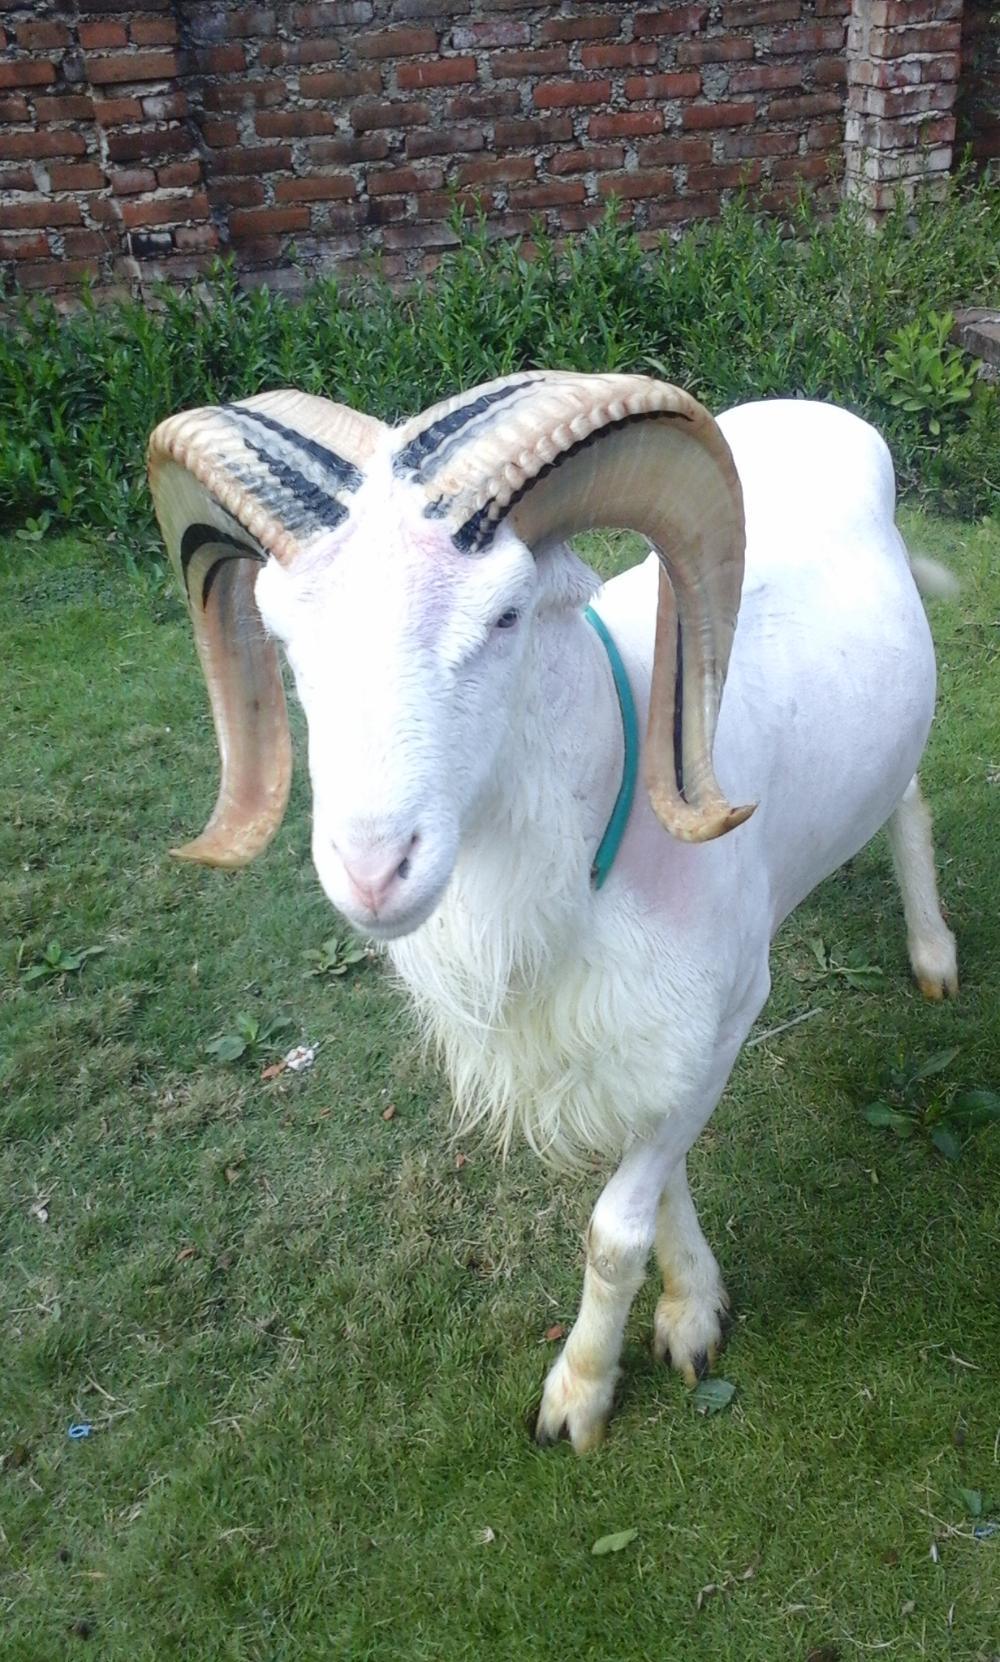 Foto Af Garut Fighting Sheep - Om Husdyrstalde | Domba in Gambar Domba Garut